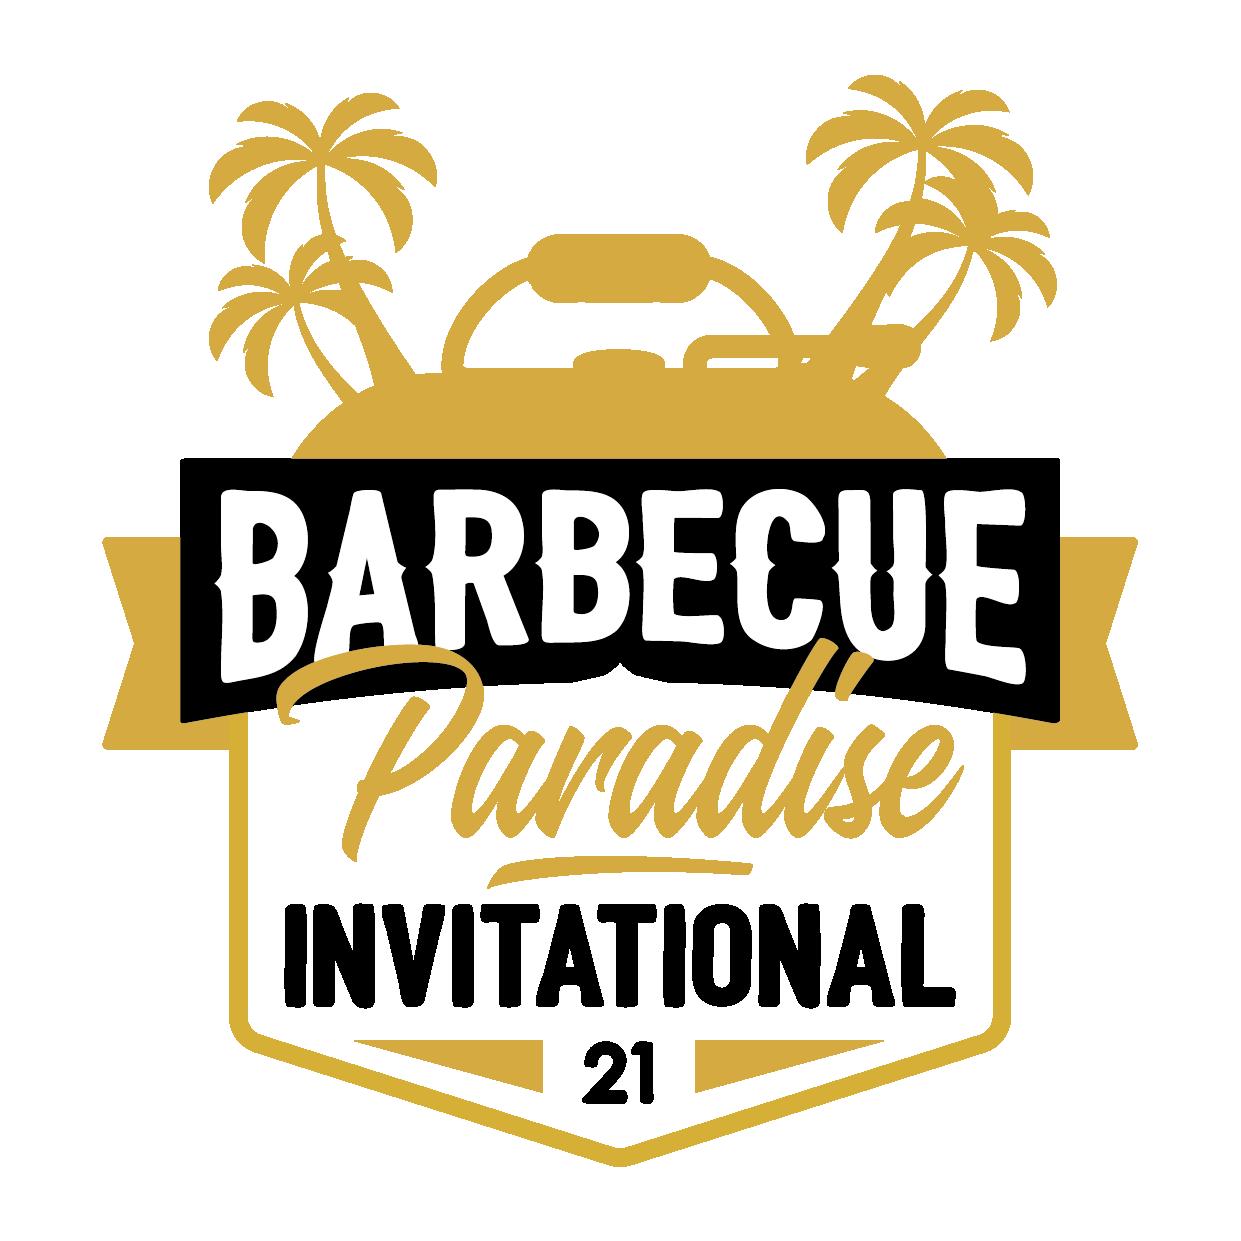 BBQ-PARADISE-INVITATIONAL-2021-LOGO1